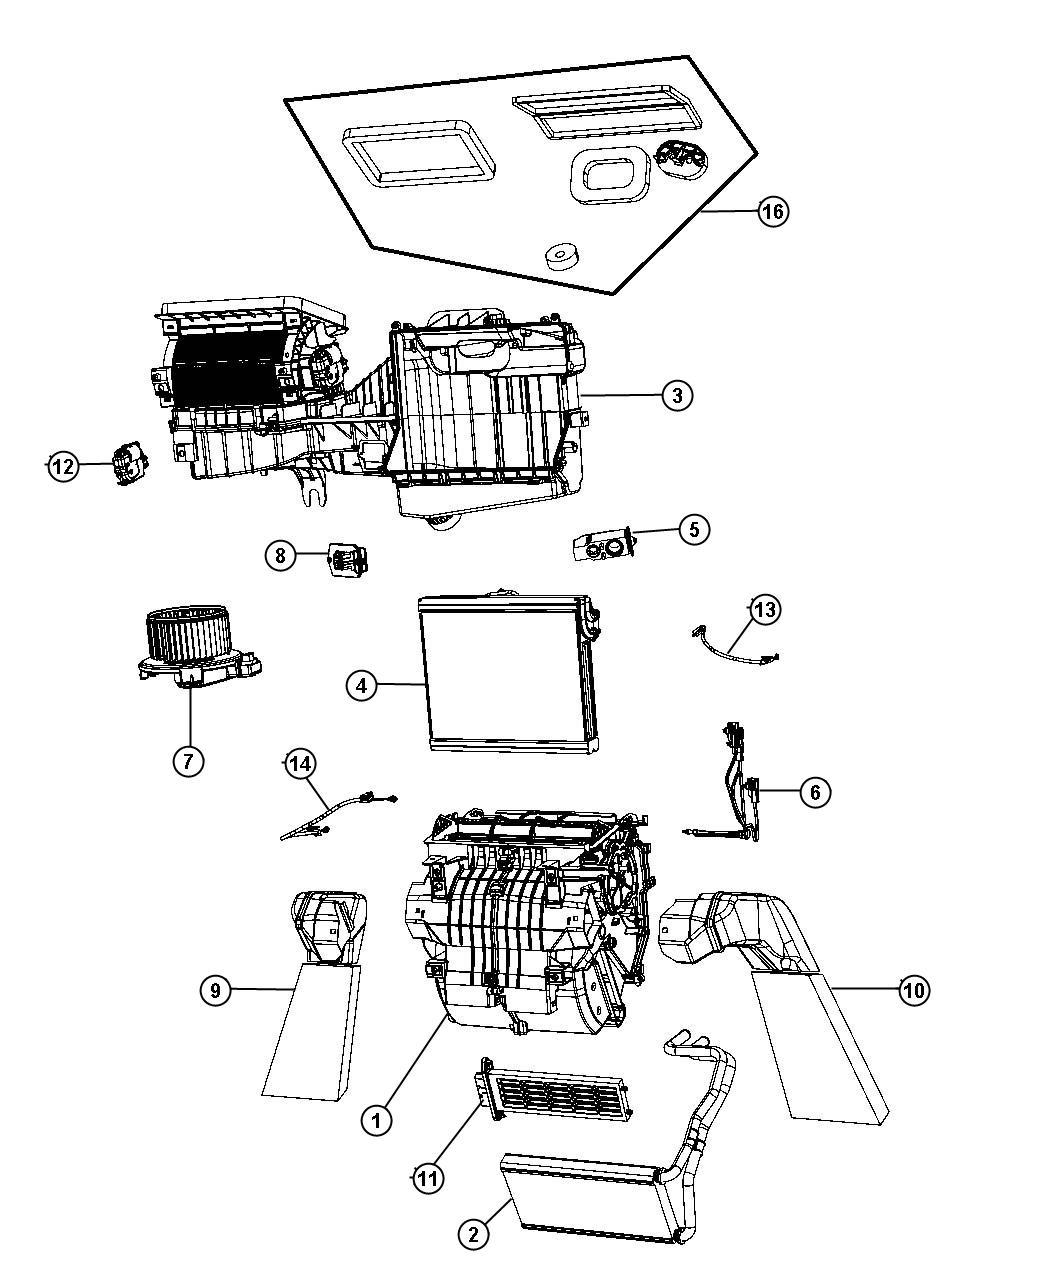 Jeep Wrangler Resistor  Blower Motor  Heater  Unit  Rhd